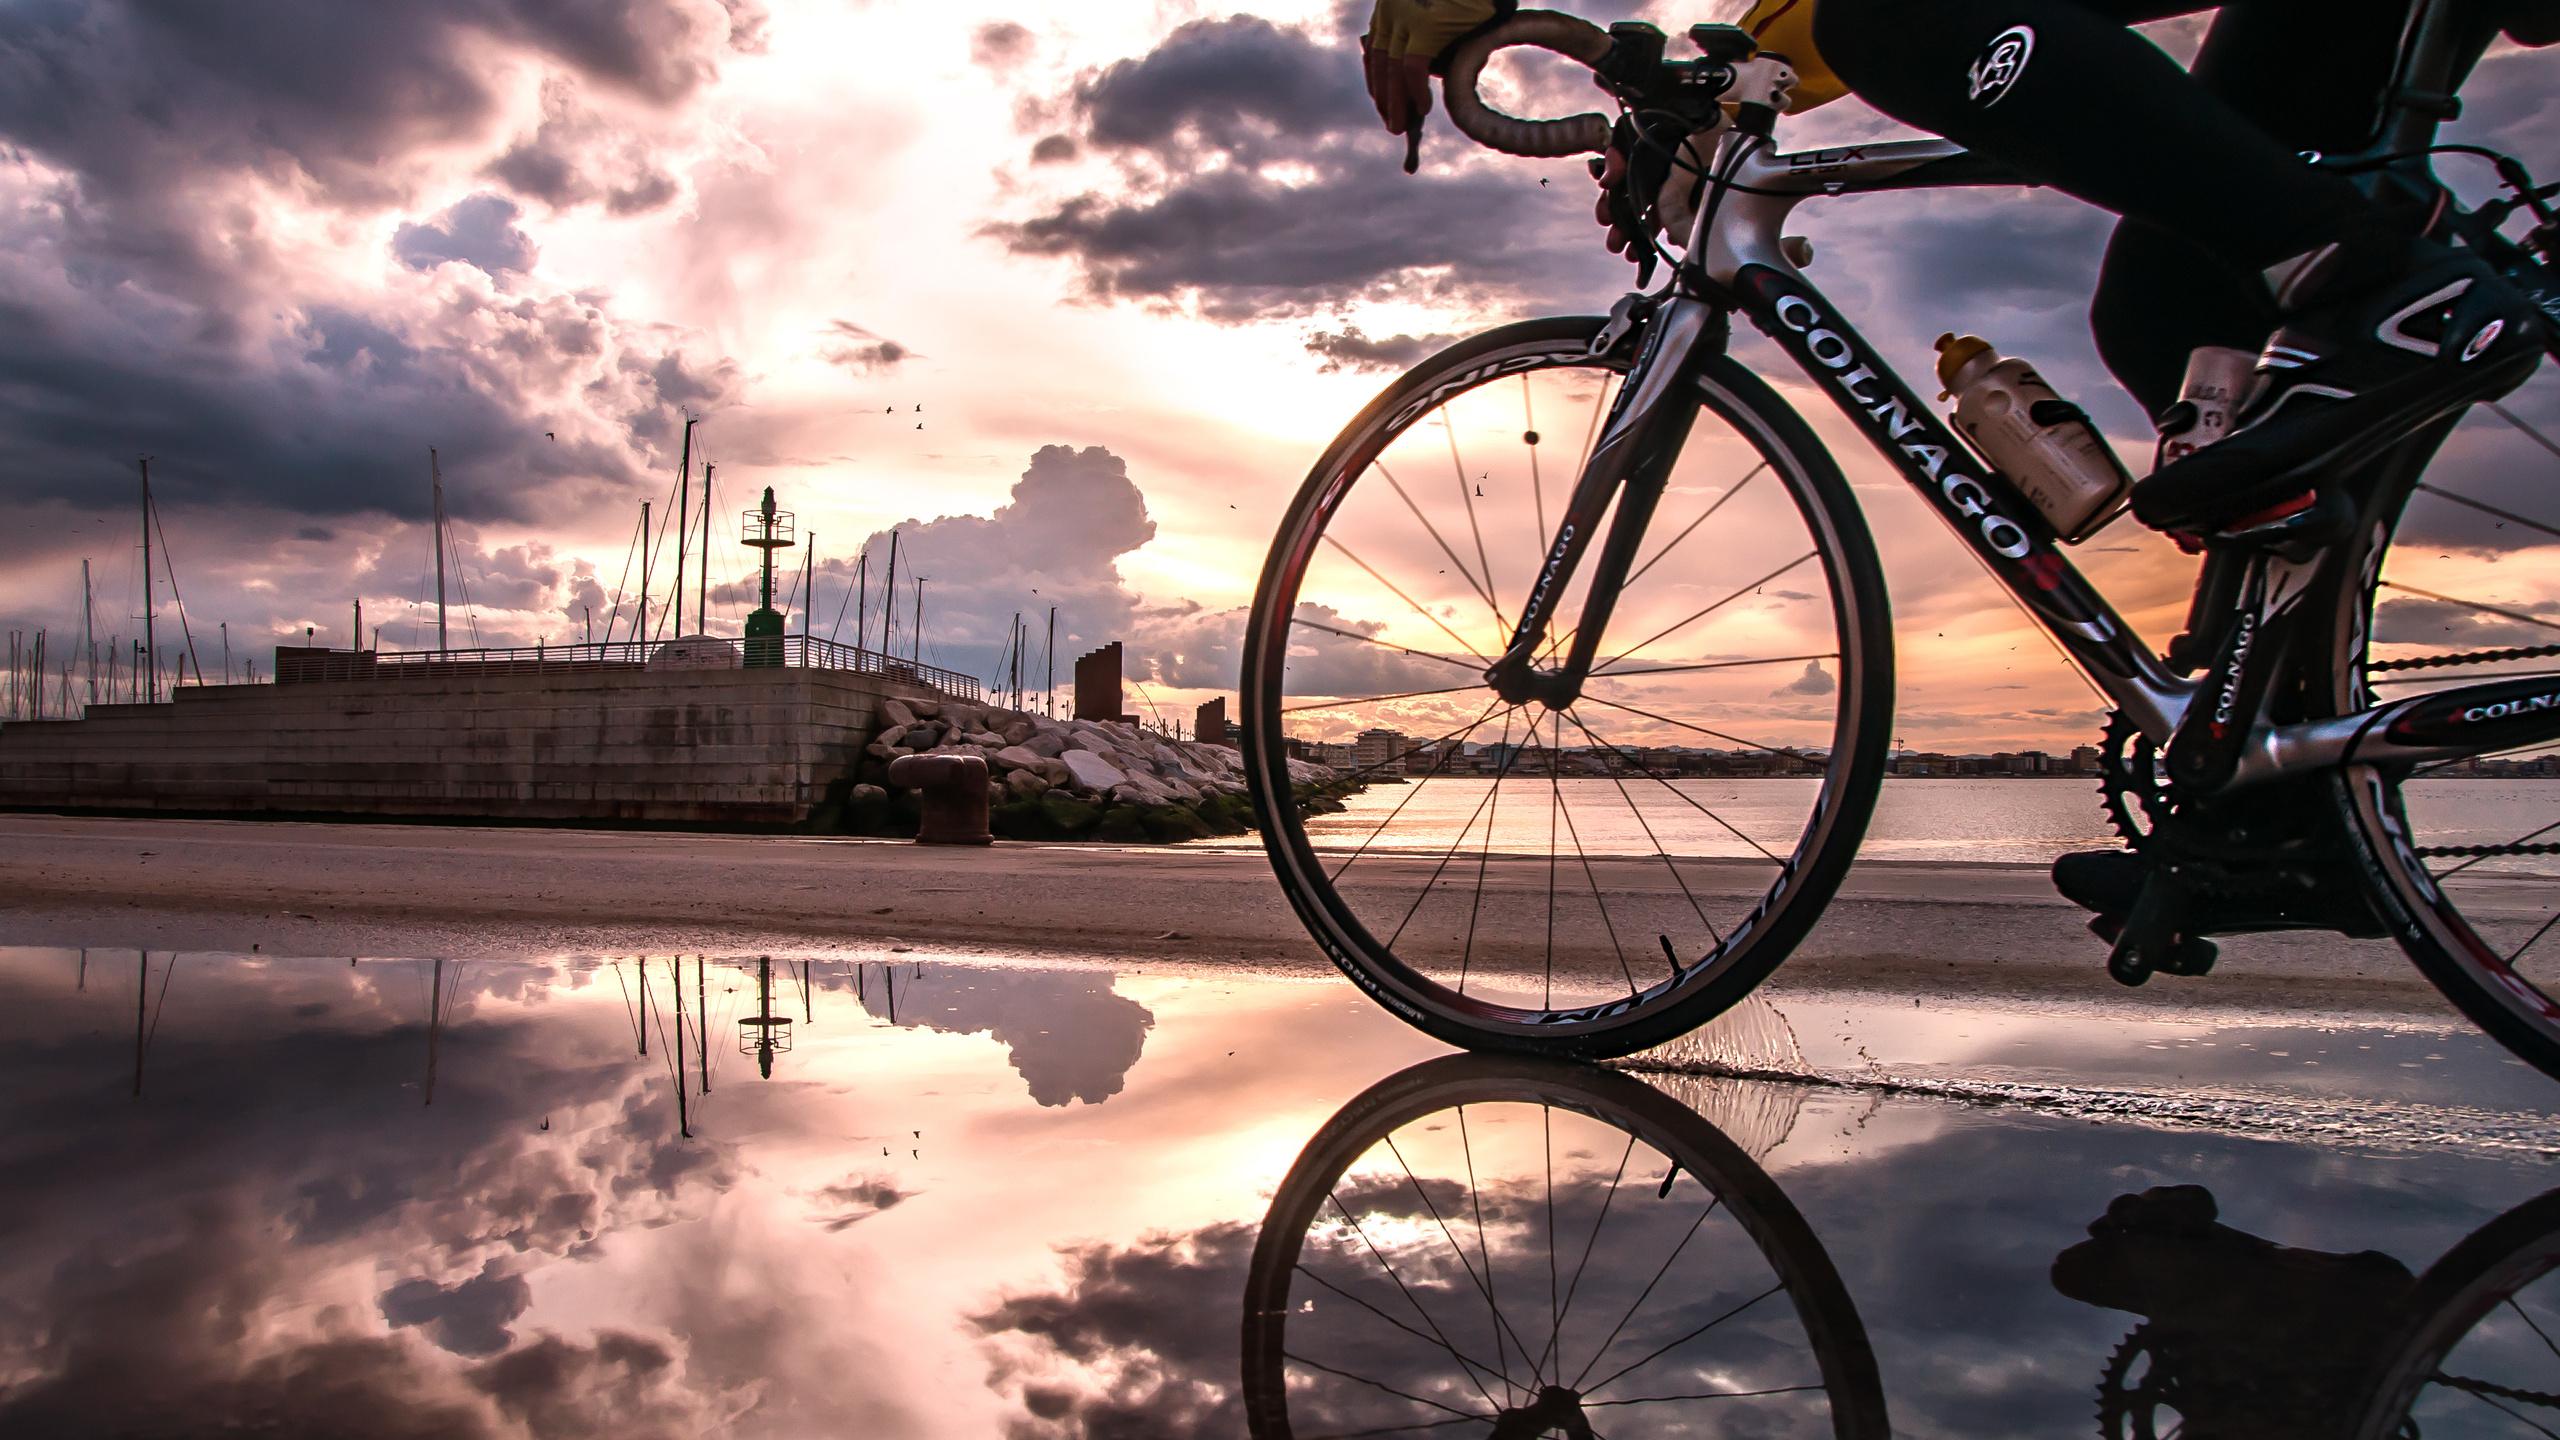 colnago, велосипед, велоспорт